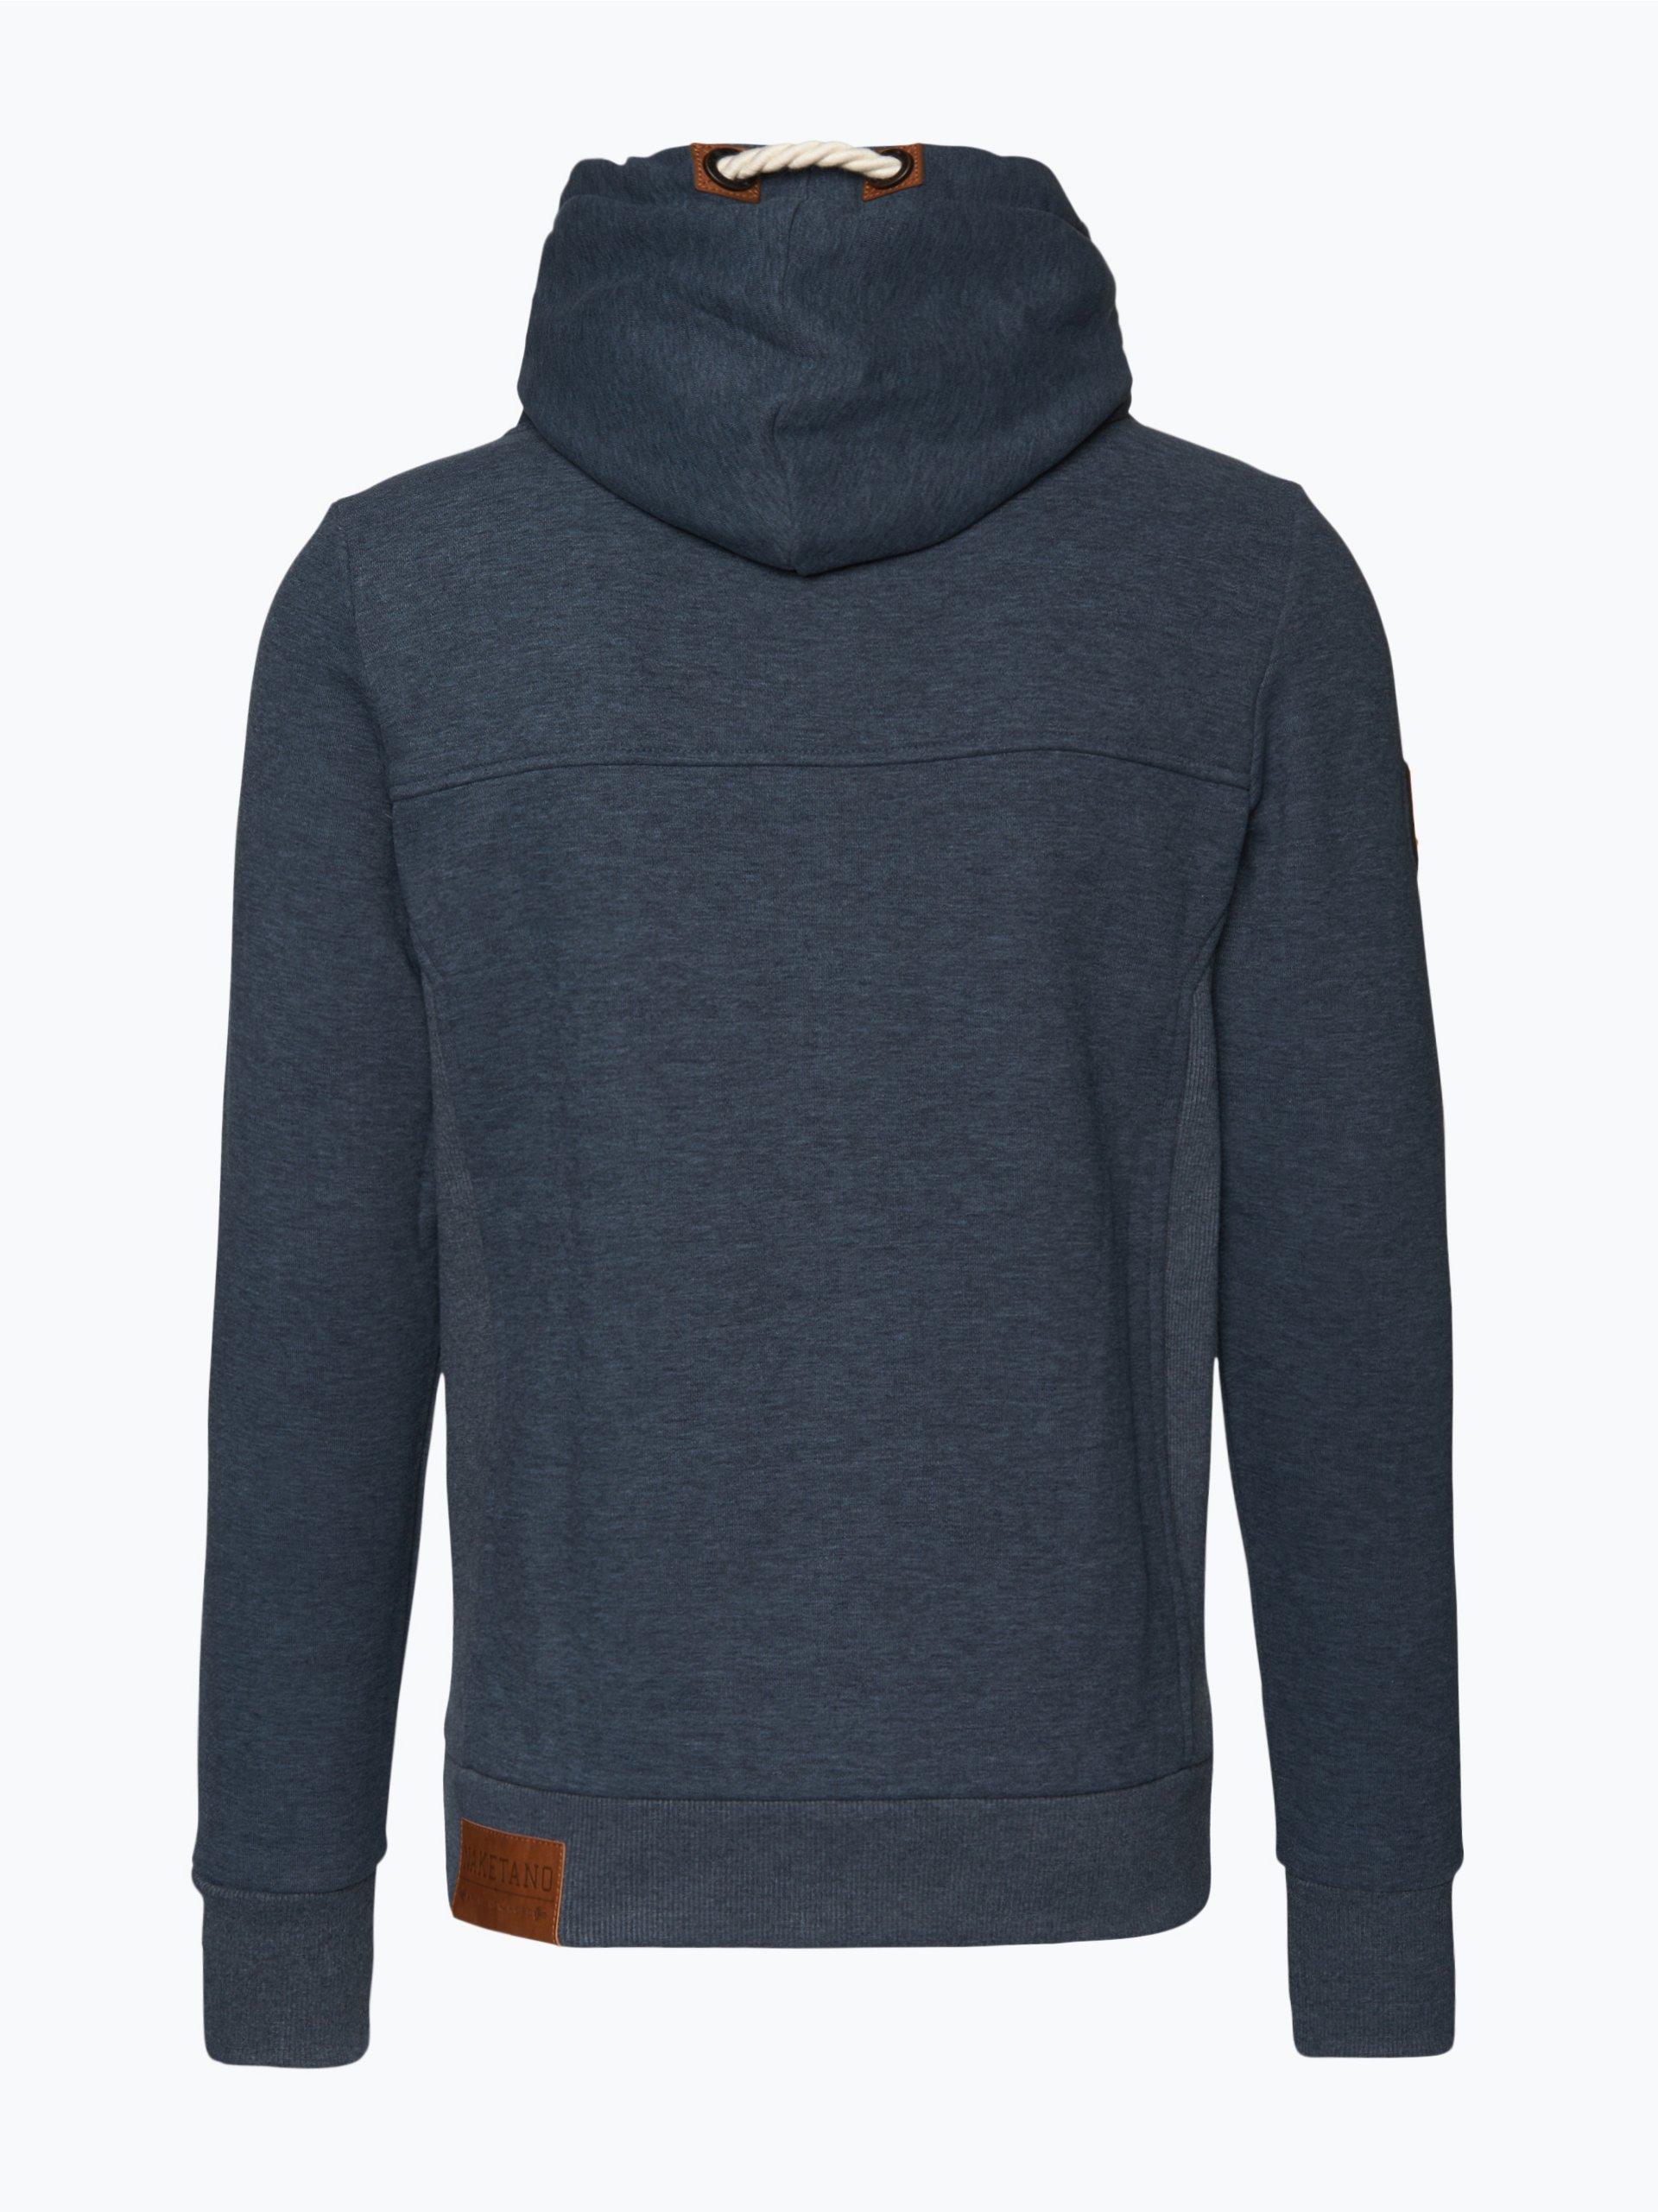 naketano herren sweatshirt pommes im weltall viii indigo. Black Bedroom Furniture Sets. Home Design Ideas